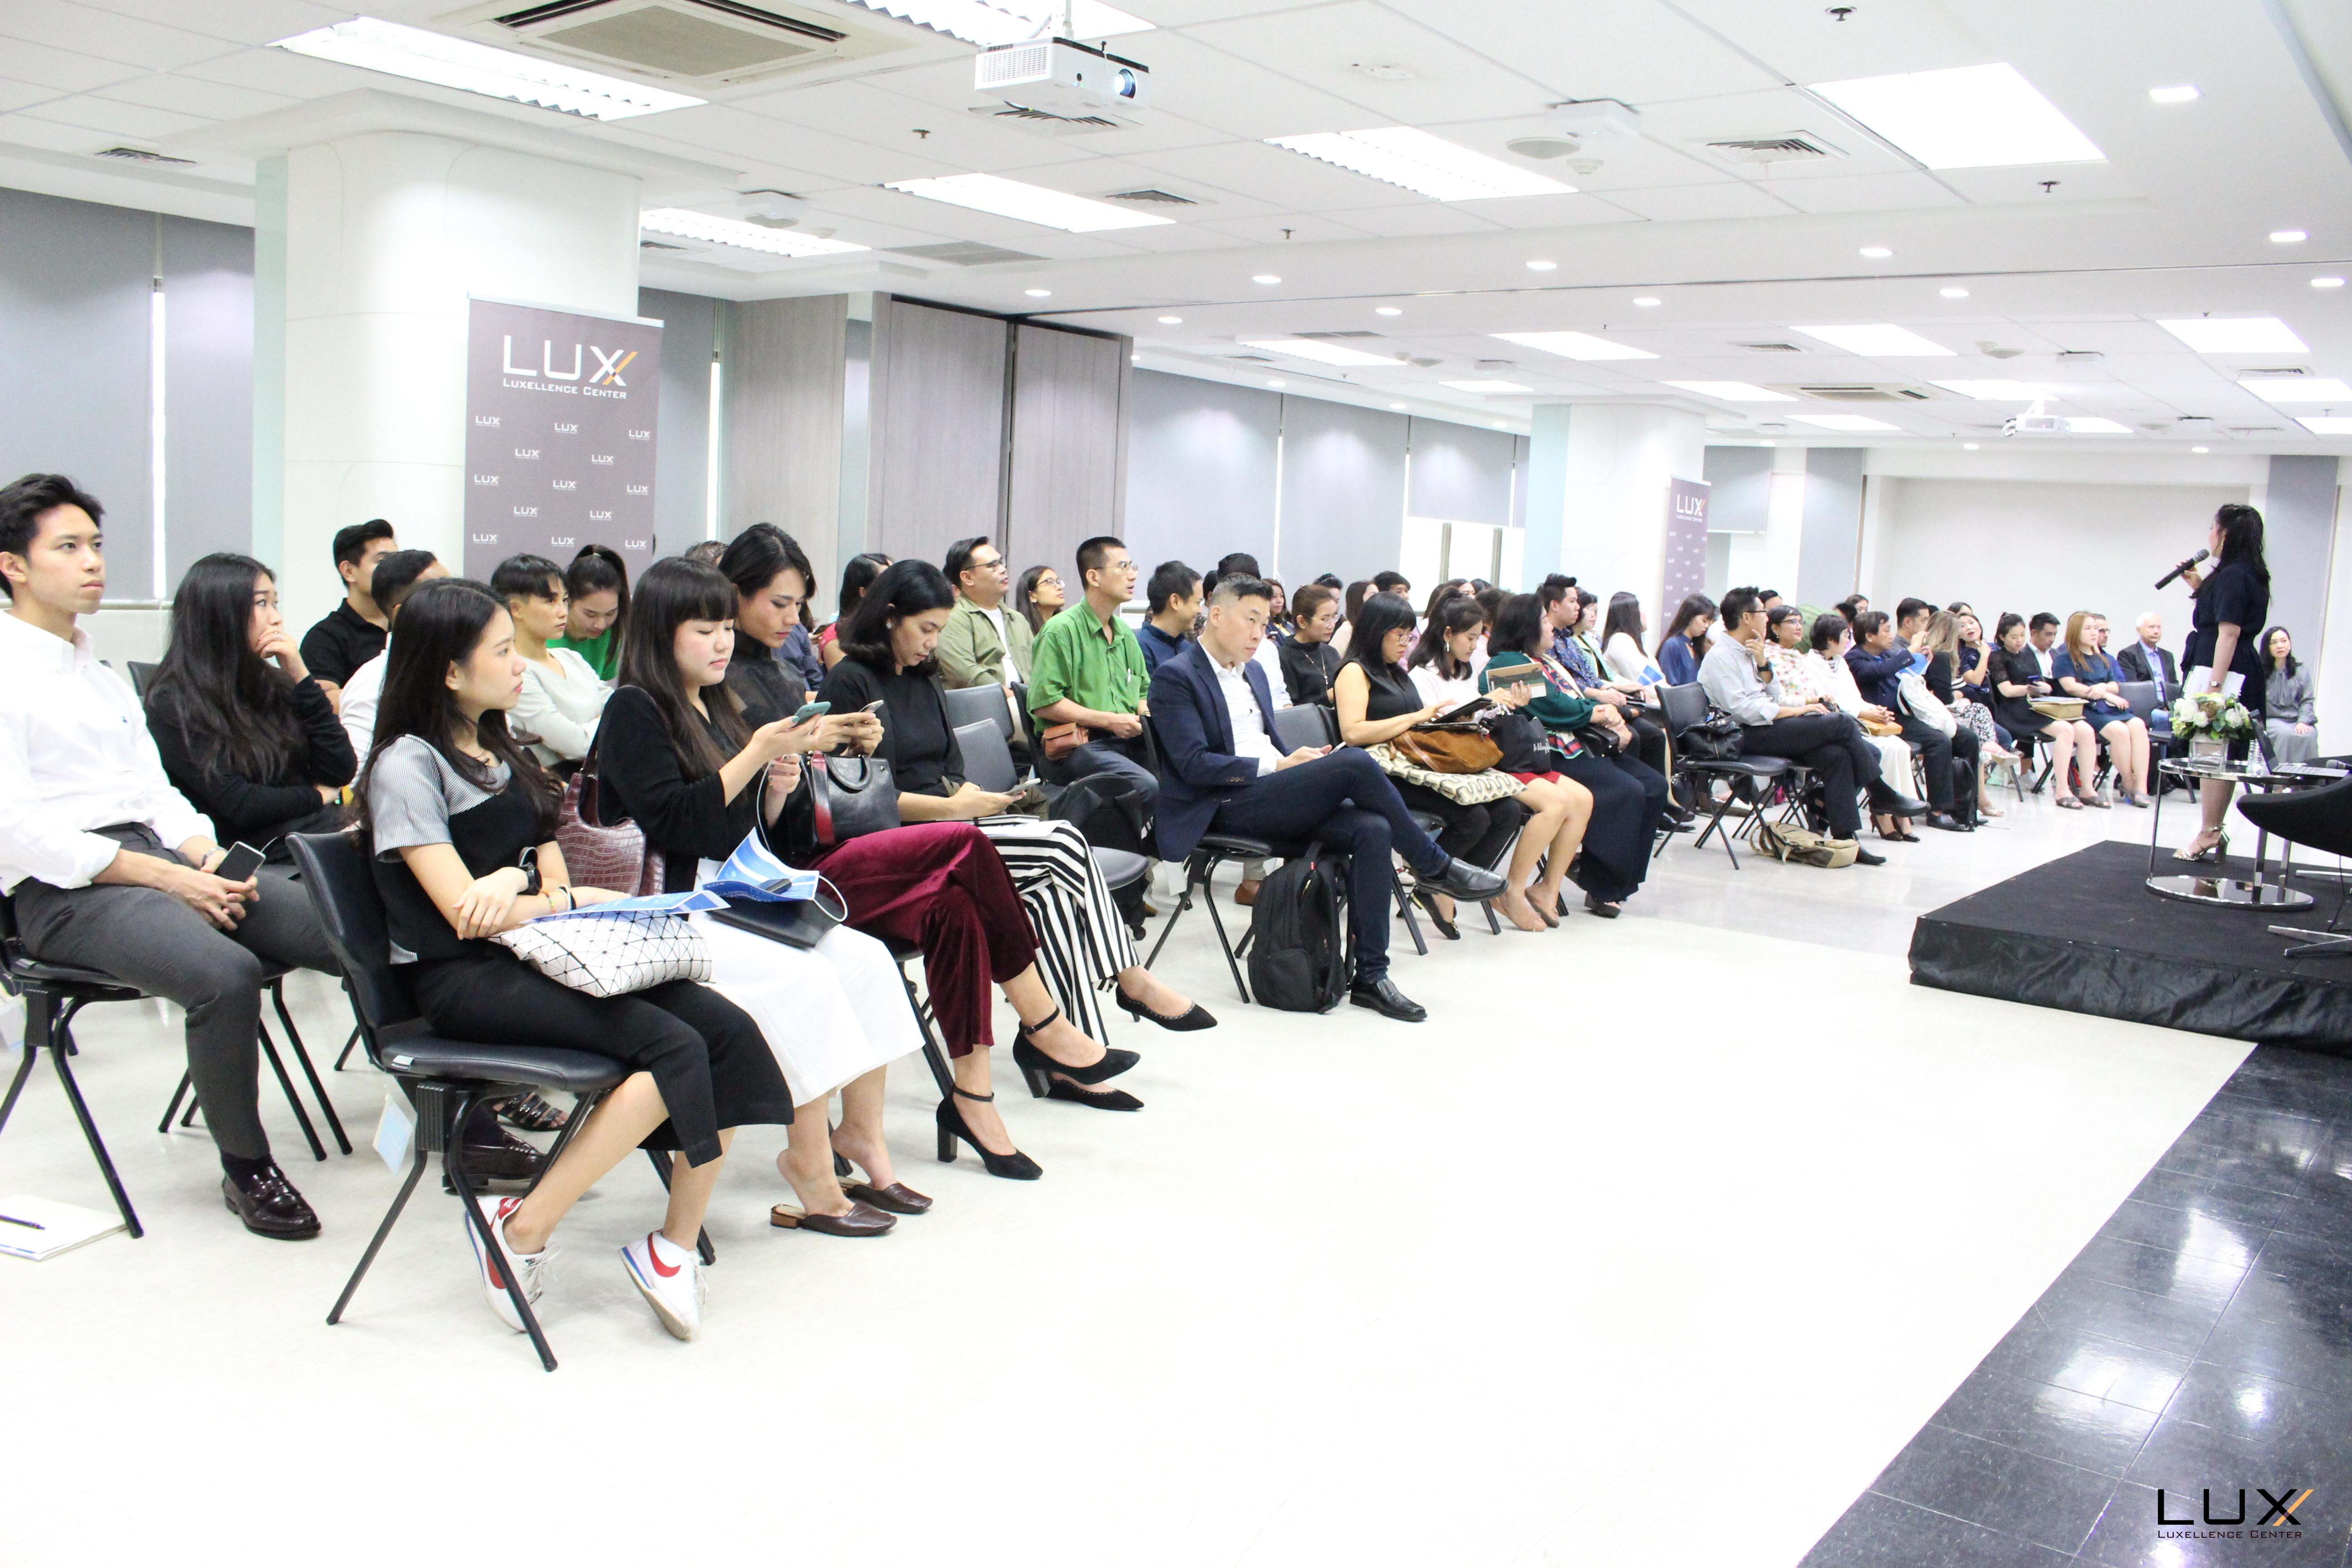 Luxellence Center จัดสัมมนาอัพเดทเทรนด์สินค้าแบรนด์หรู